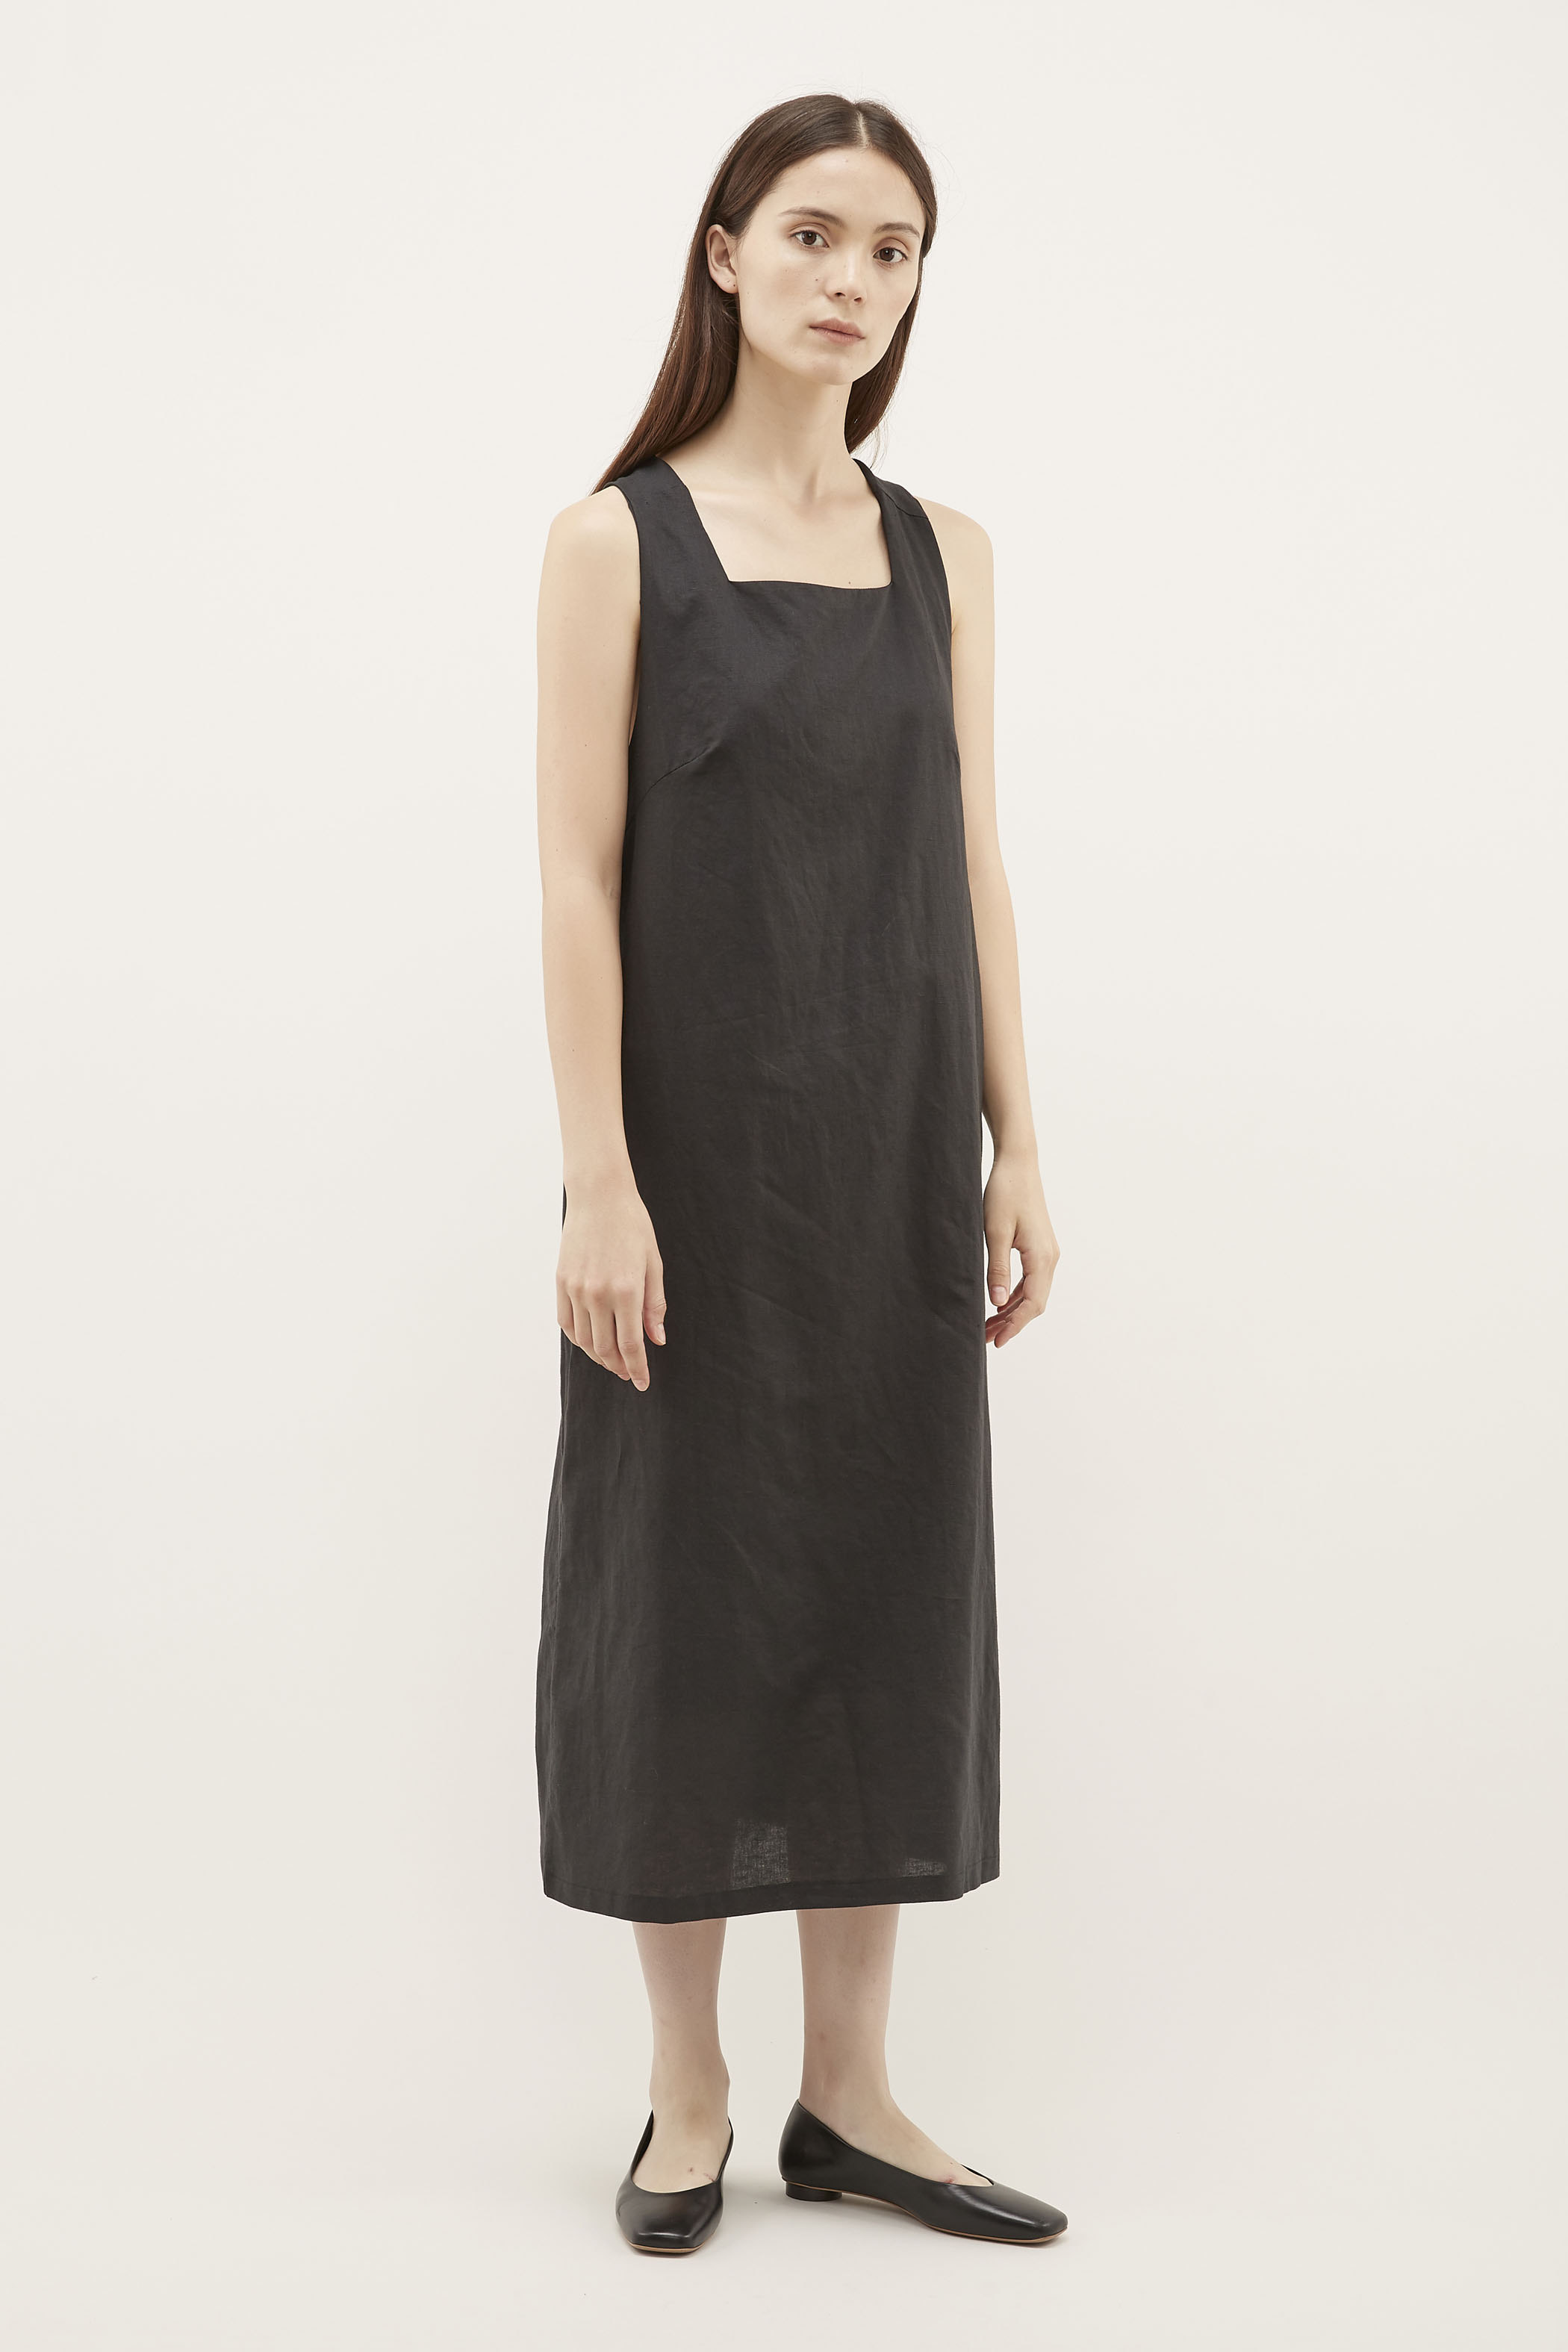 Mazel Twist-knot Dress